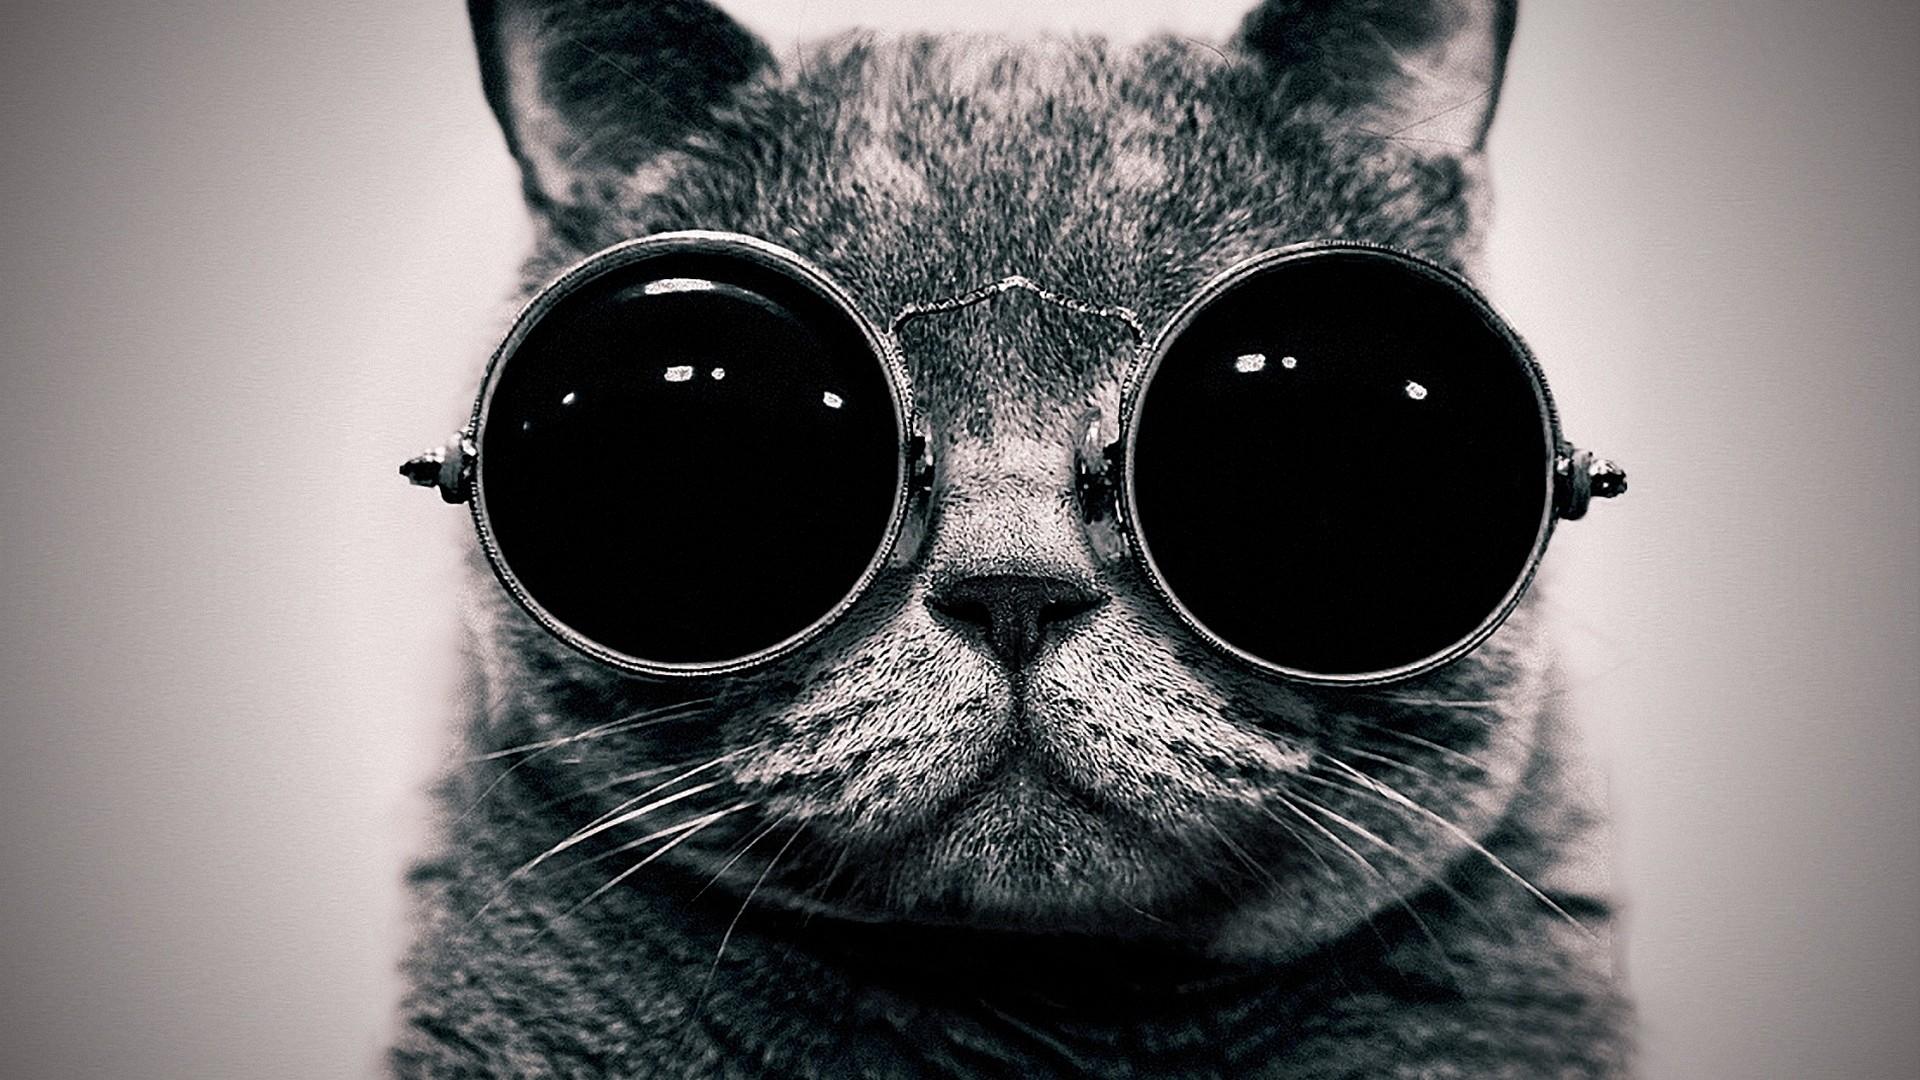 Cat In The Glasses Wallpaper   Download Wallpaper Nature 1920x1080